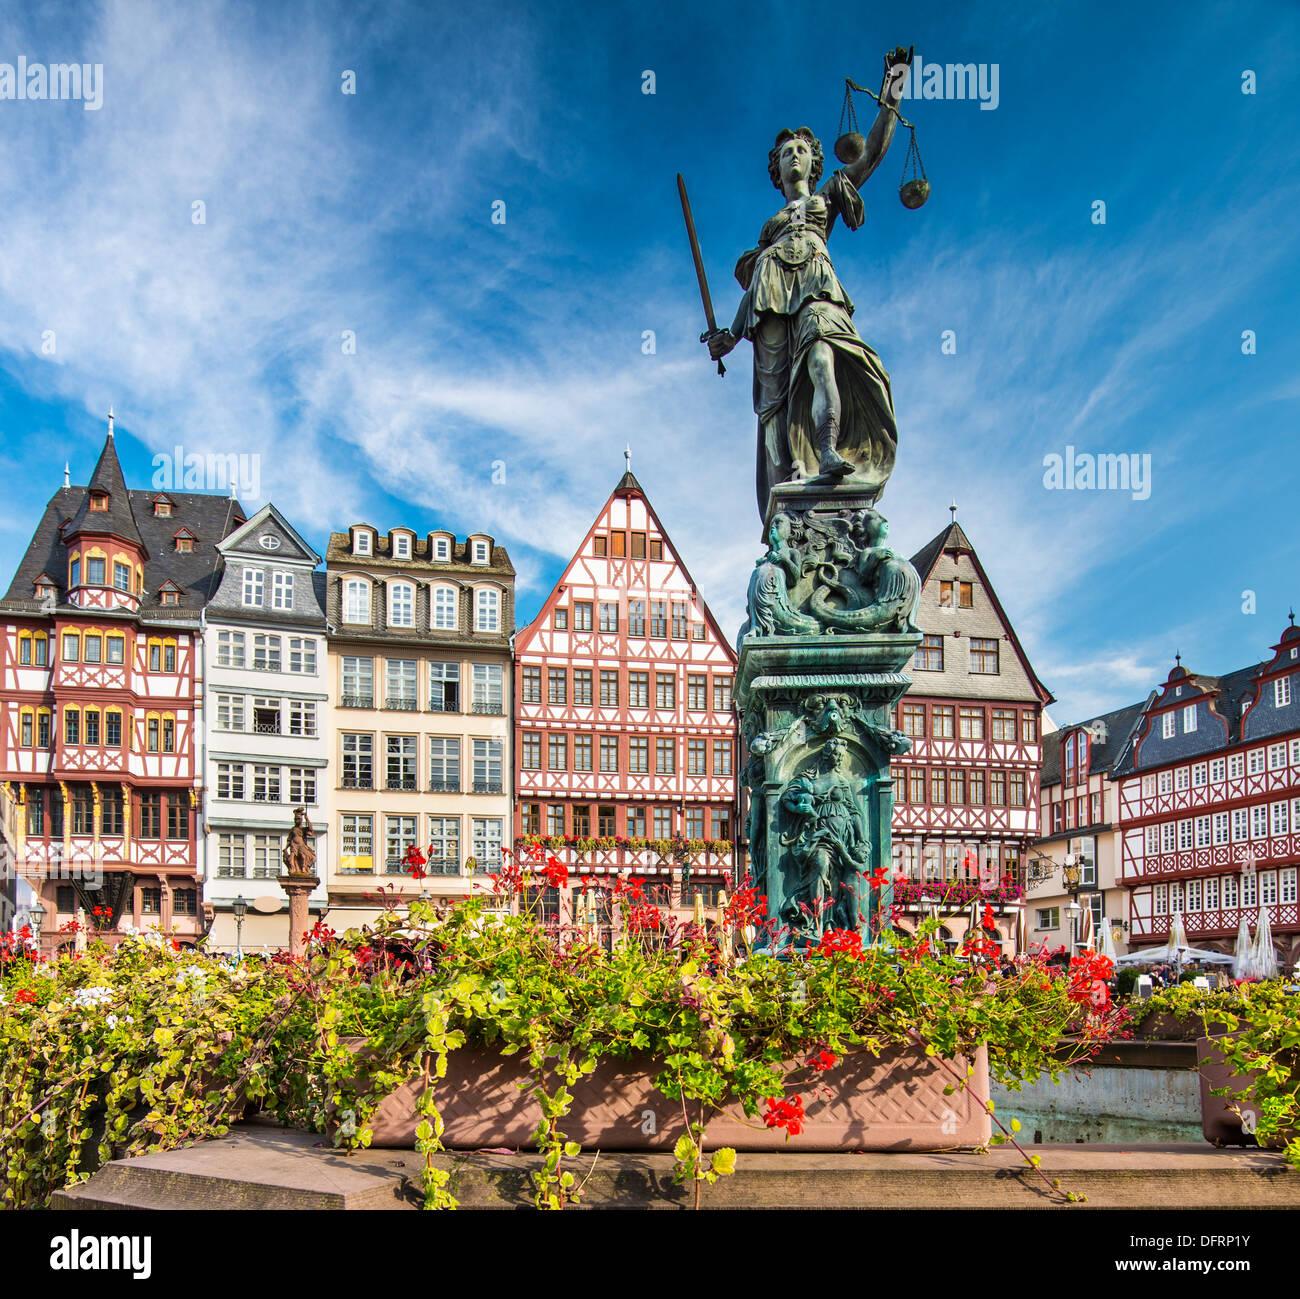 The Old City of Frankfurt, Germany. - Stock Image